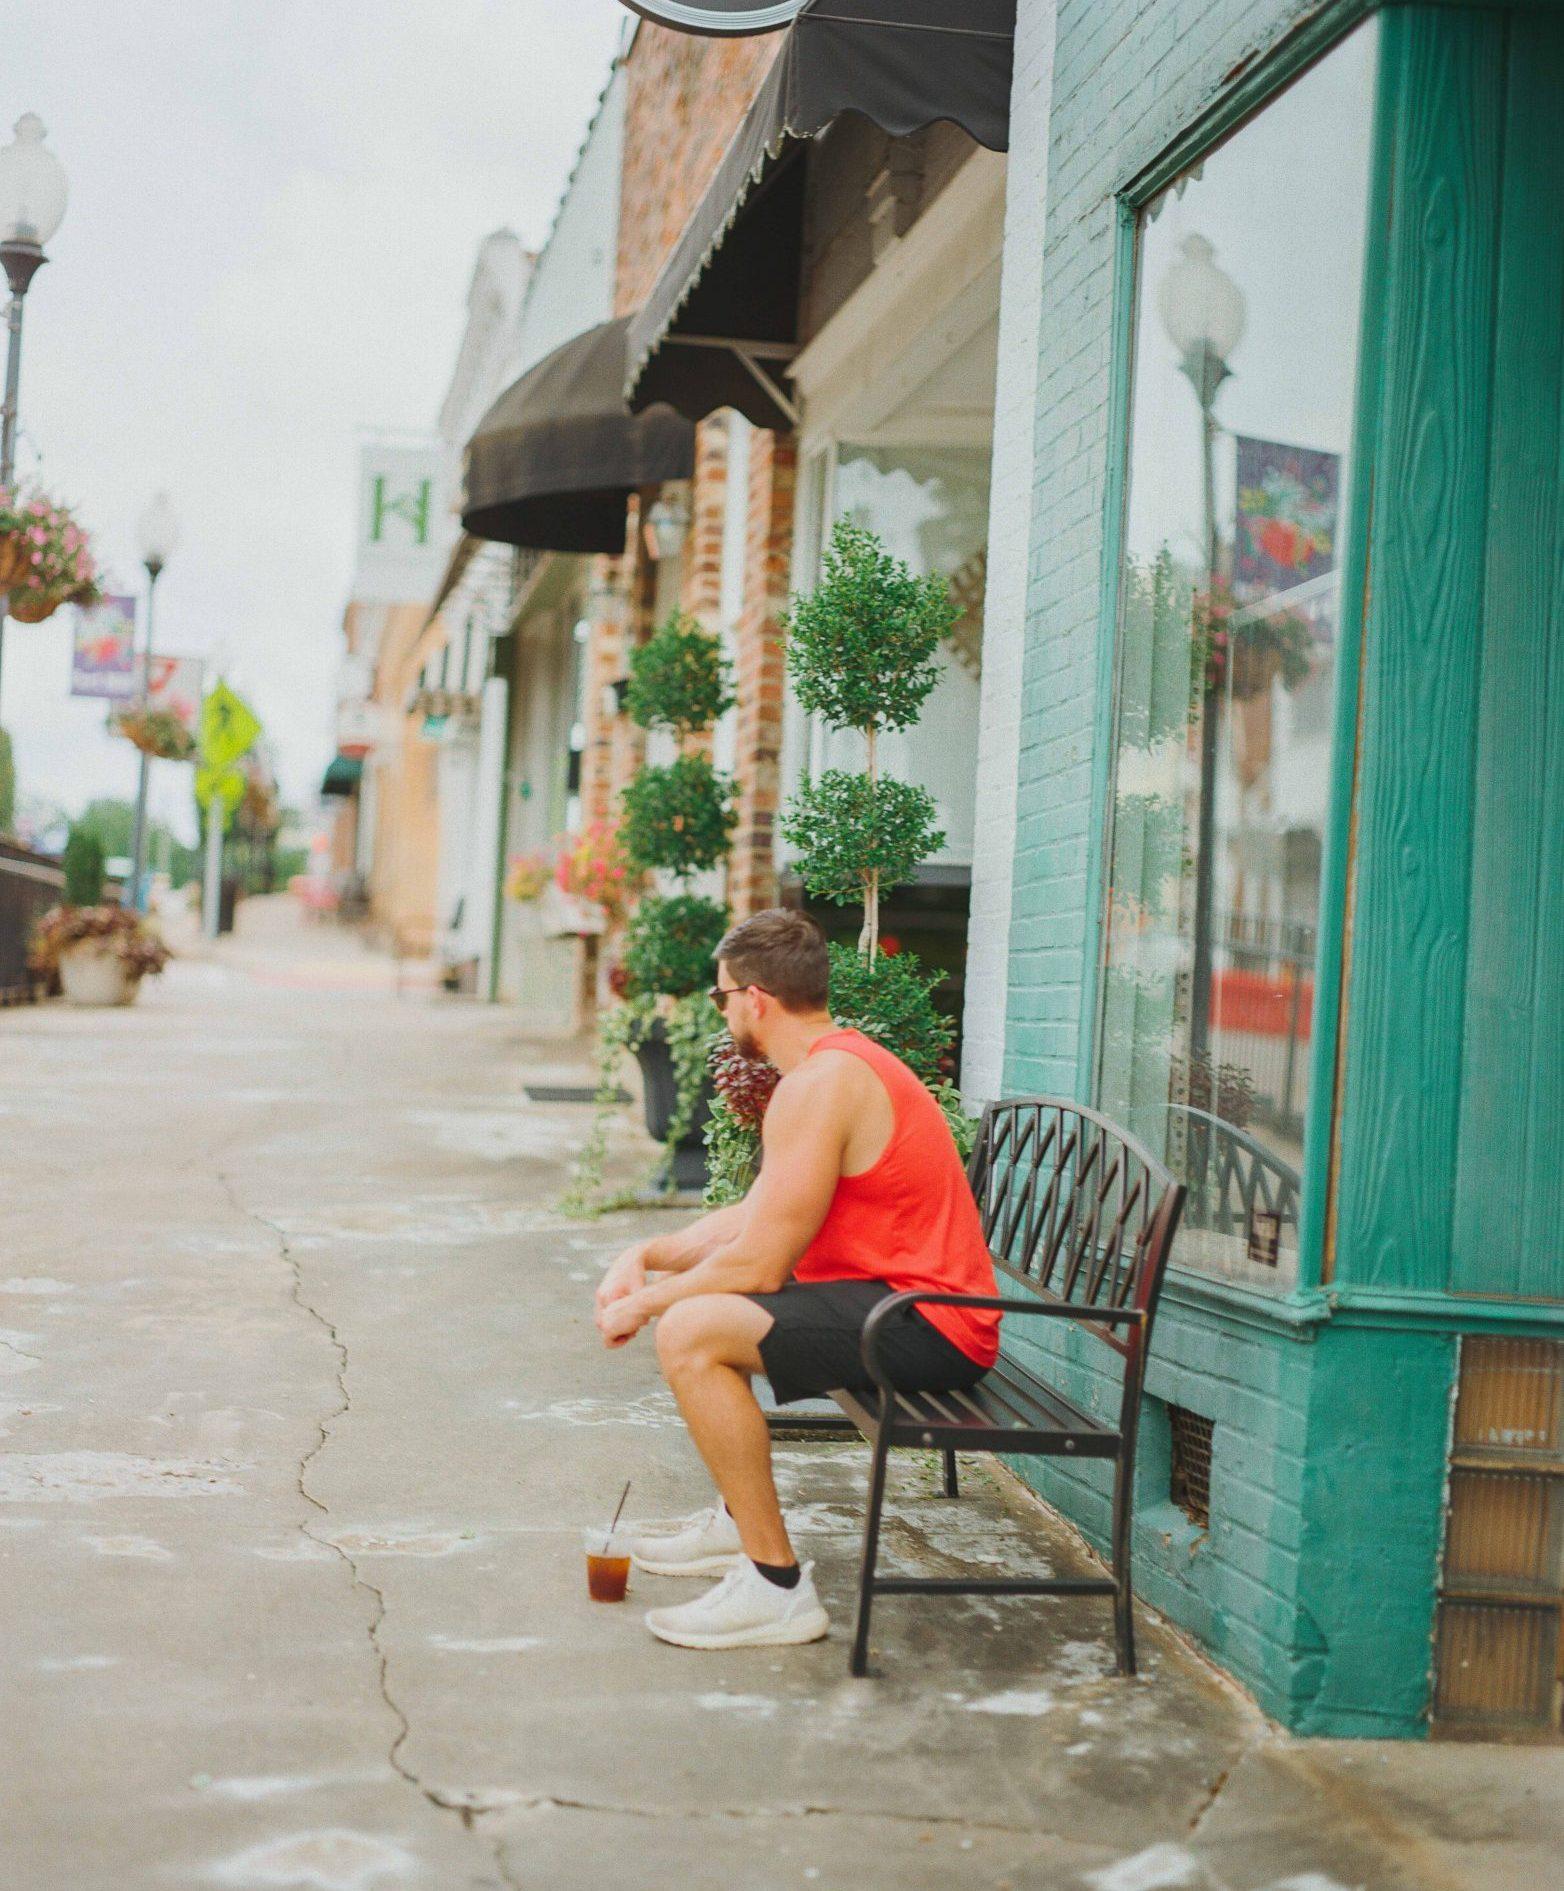 film, Pentax 6x7, bush n vine, york South Carolina, York county, fort mill, York, peaches, zinnias, farm, film photography, barn, peach stand, fort mill, sc, tom hall, Main Street, downtown fort mill, mud olive